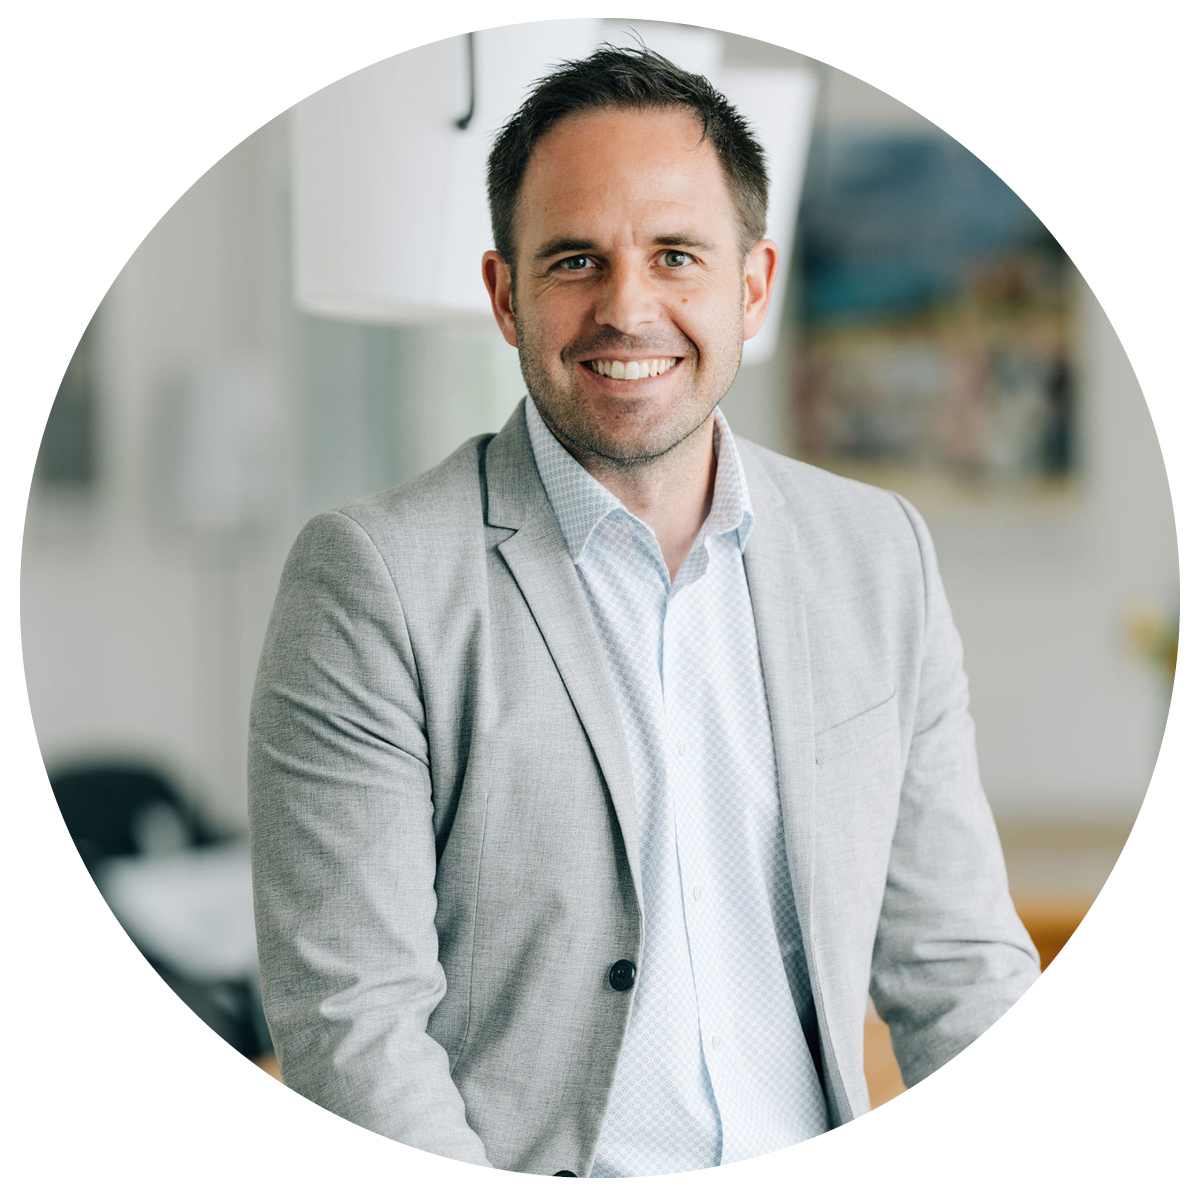 Chris Rosser, CEO